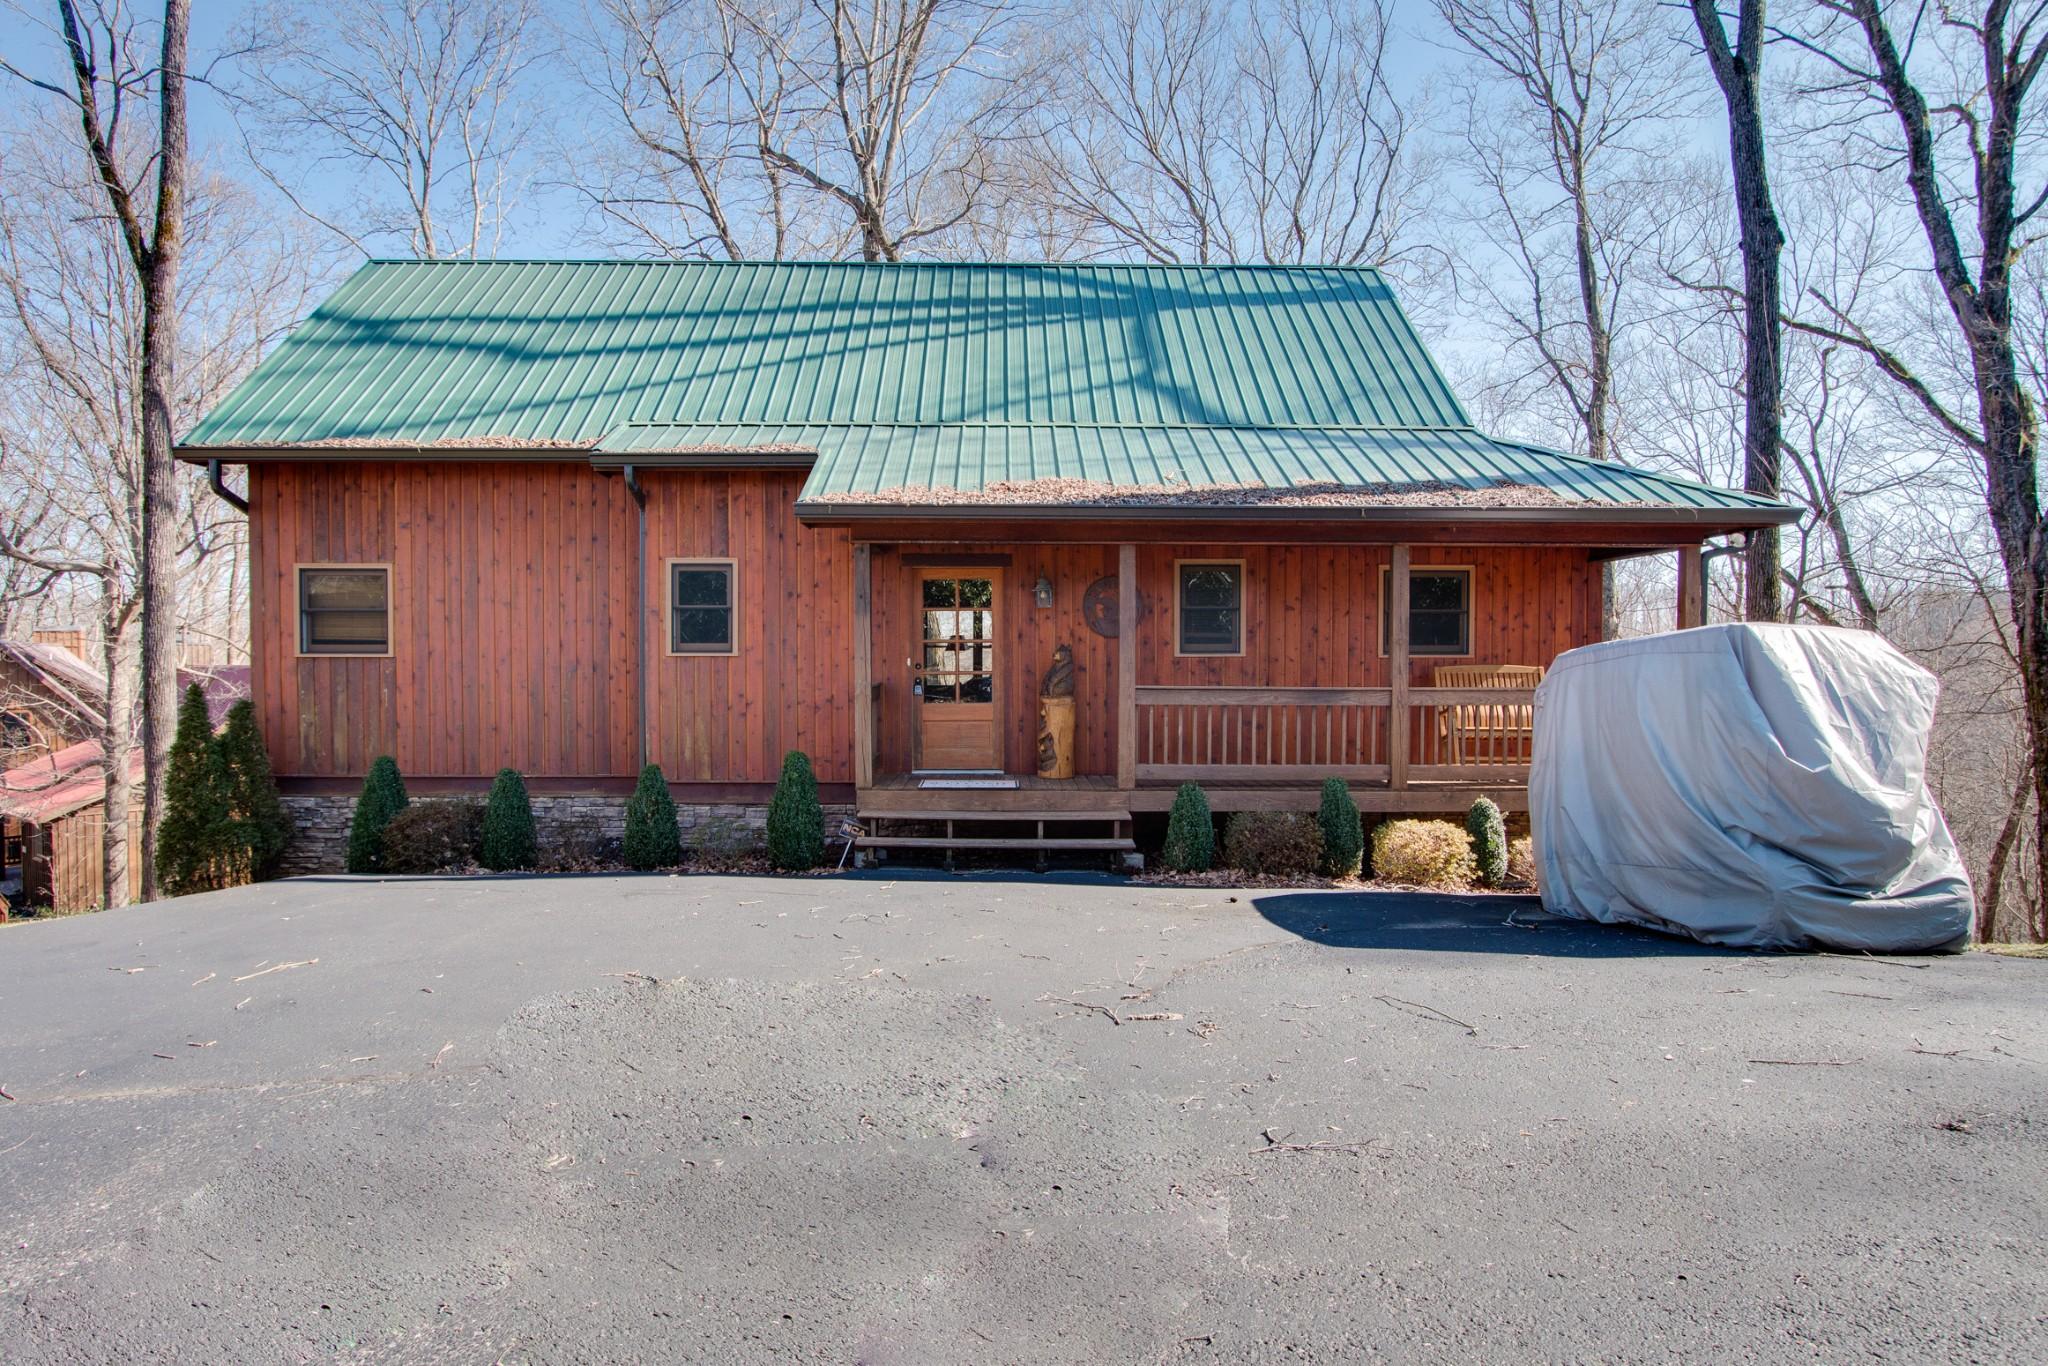 134 Village Way, Lancaster, TN 38569 - Lancaster, TN real estate listing